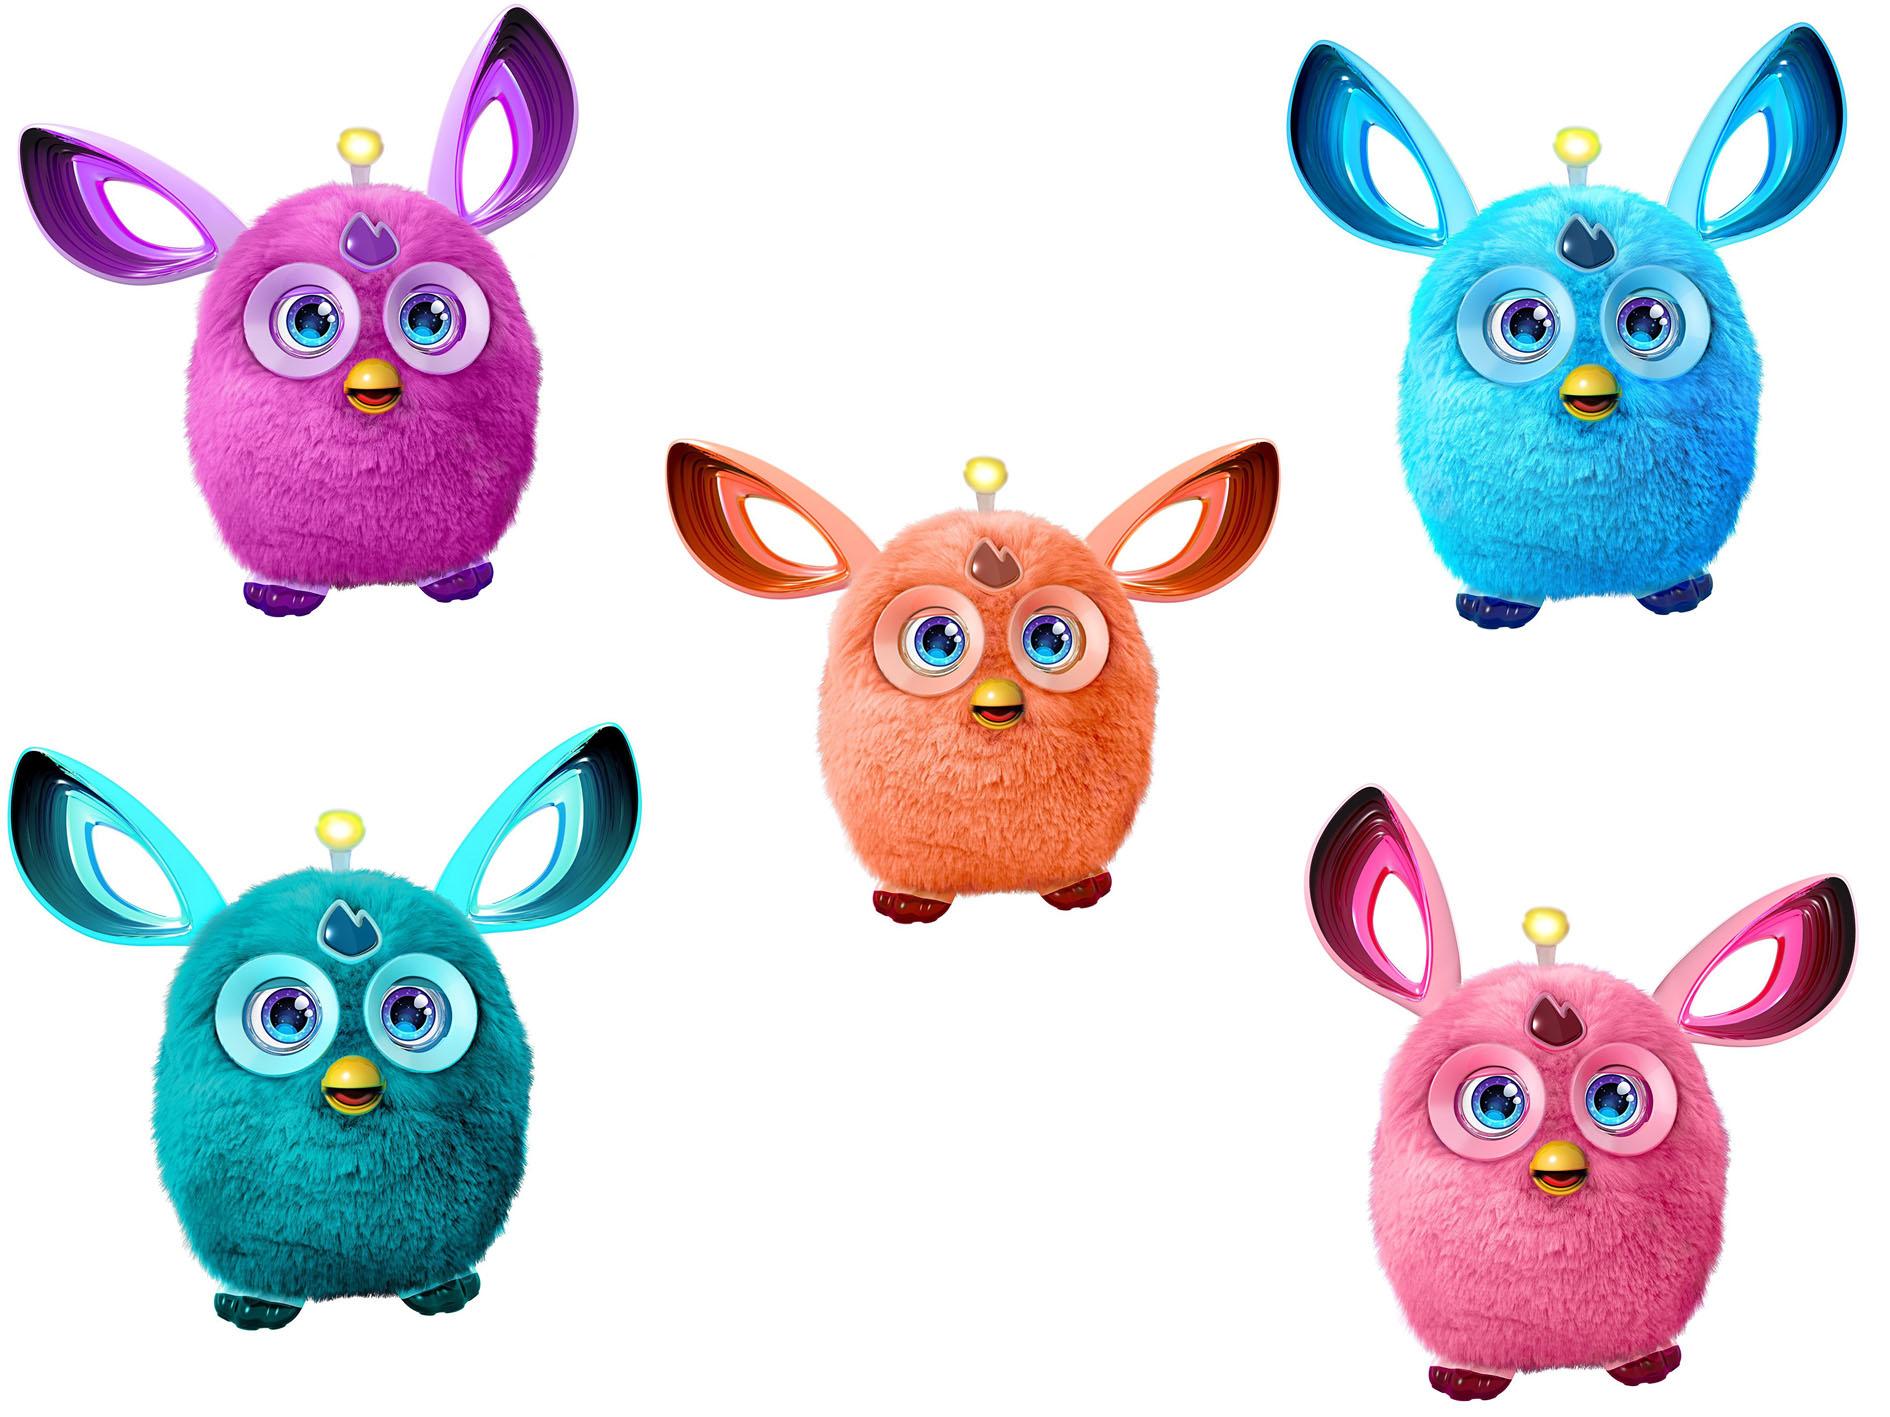 Интерактивная игрушка Ферби Коннект, серия ЛедFurby, Лохматики, YooHoo&amp;Friends <br>Интерактивная игрушка Ферби Коннект, серия Лед<br>